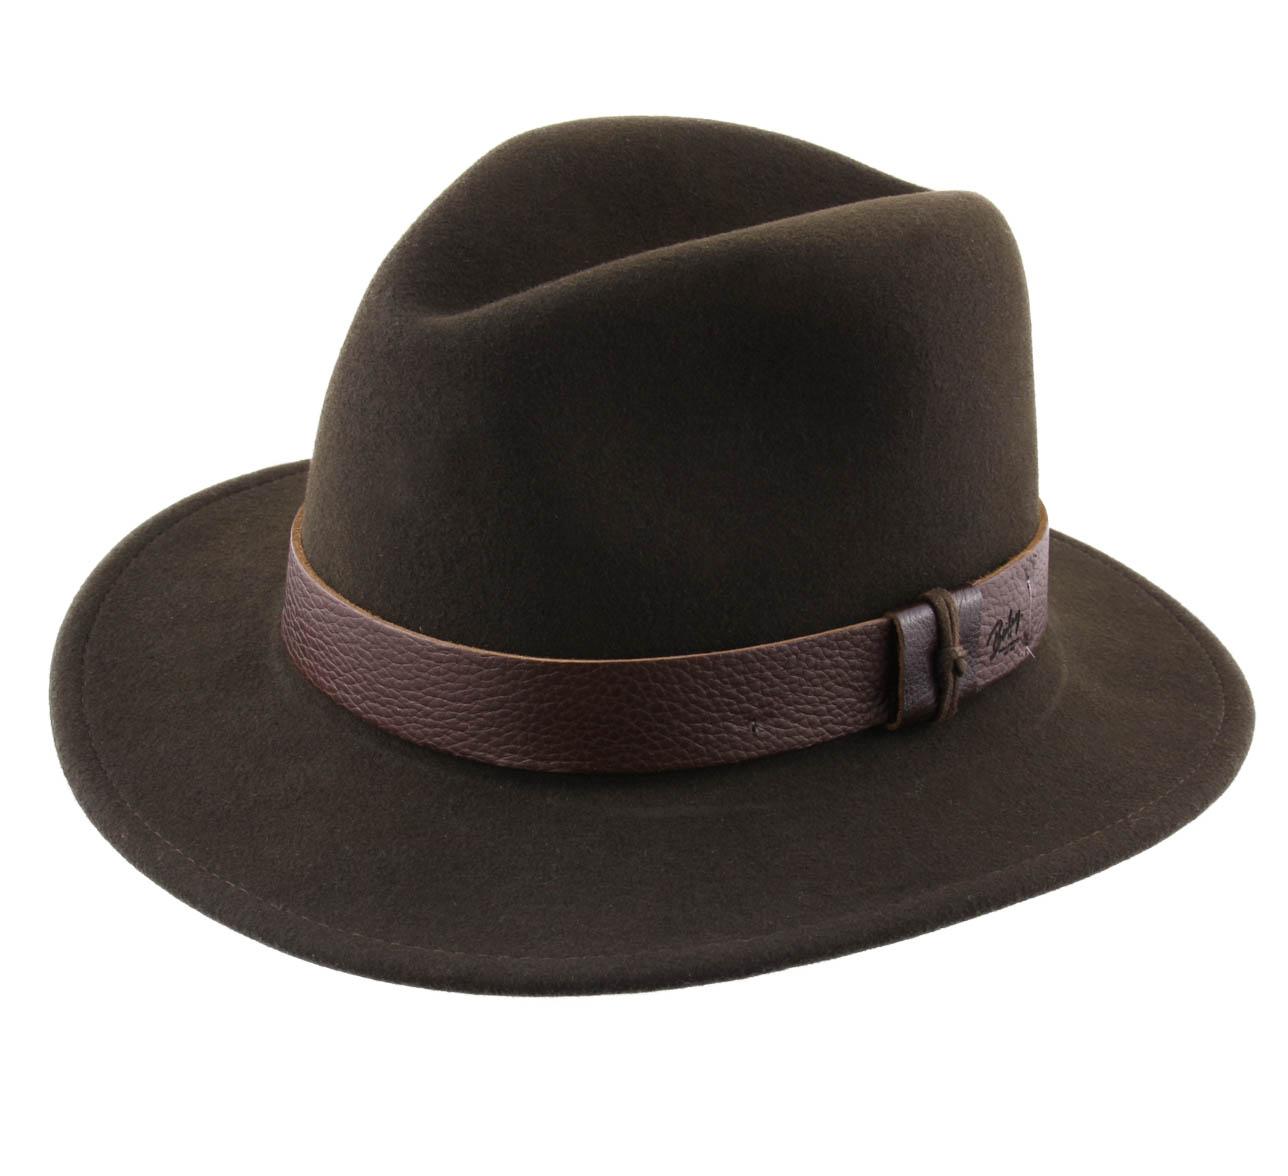 Chapeau Homme Prindle Chapeau Bailey